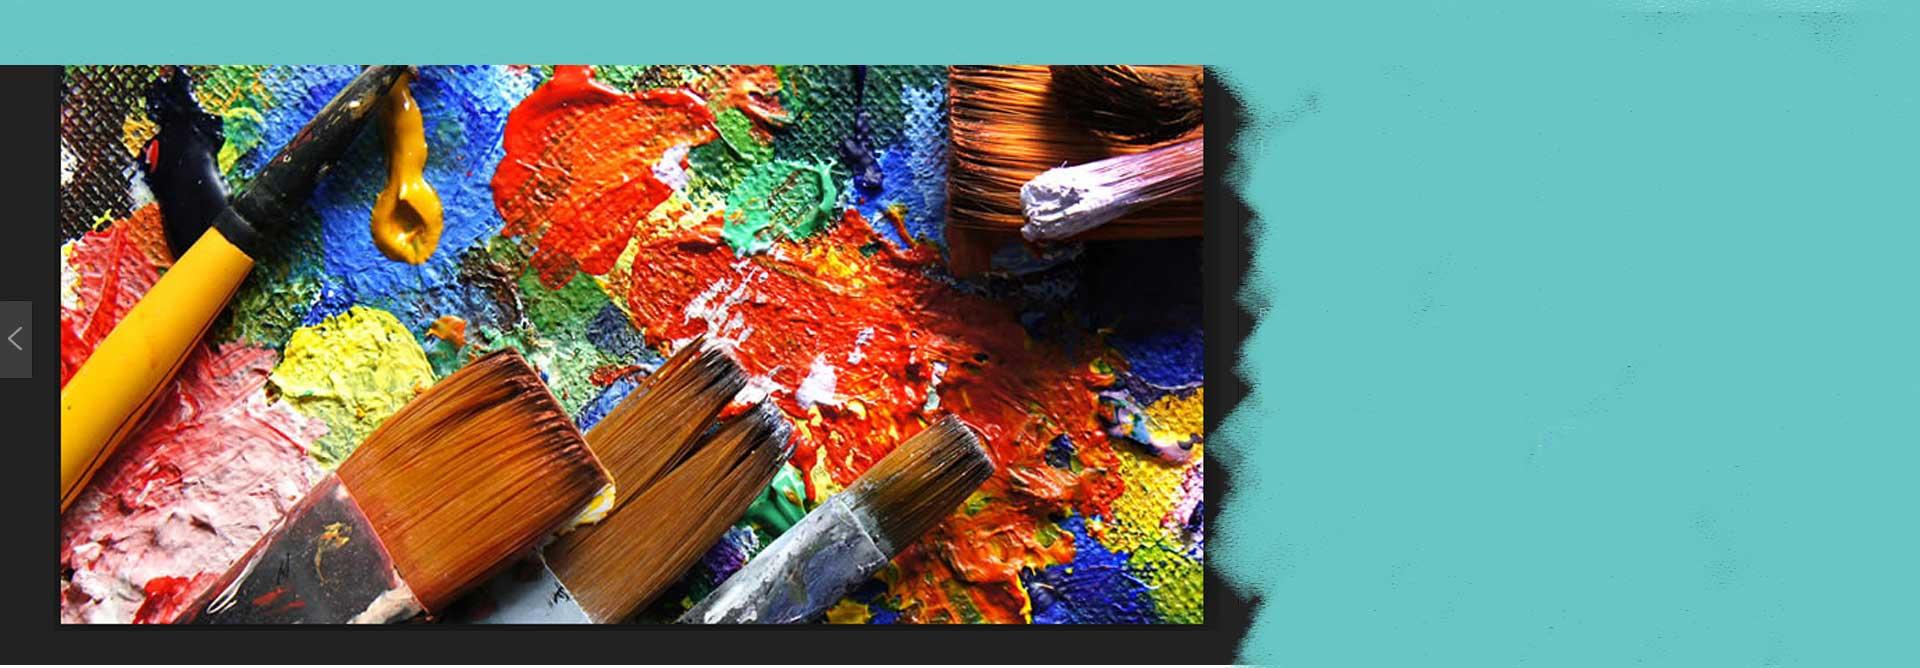 professiona1 photographe 9a - ۹۹ روش برای فروش آثار هنری